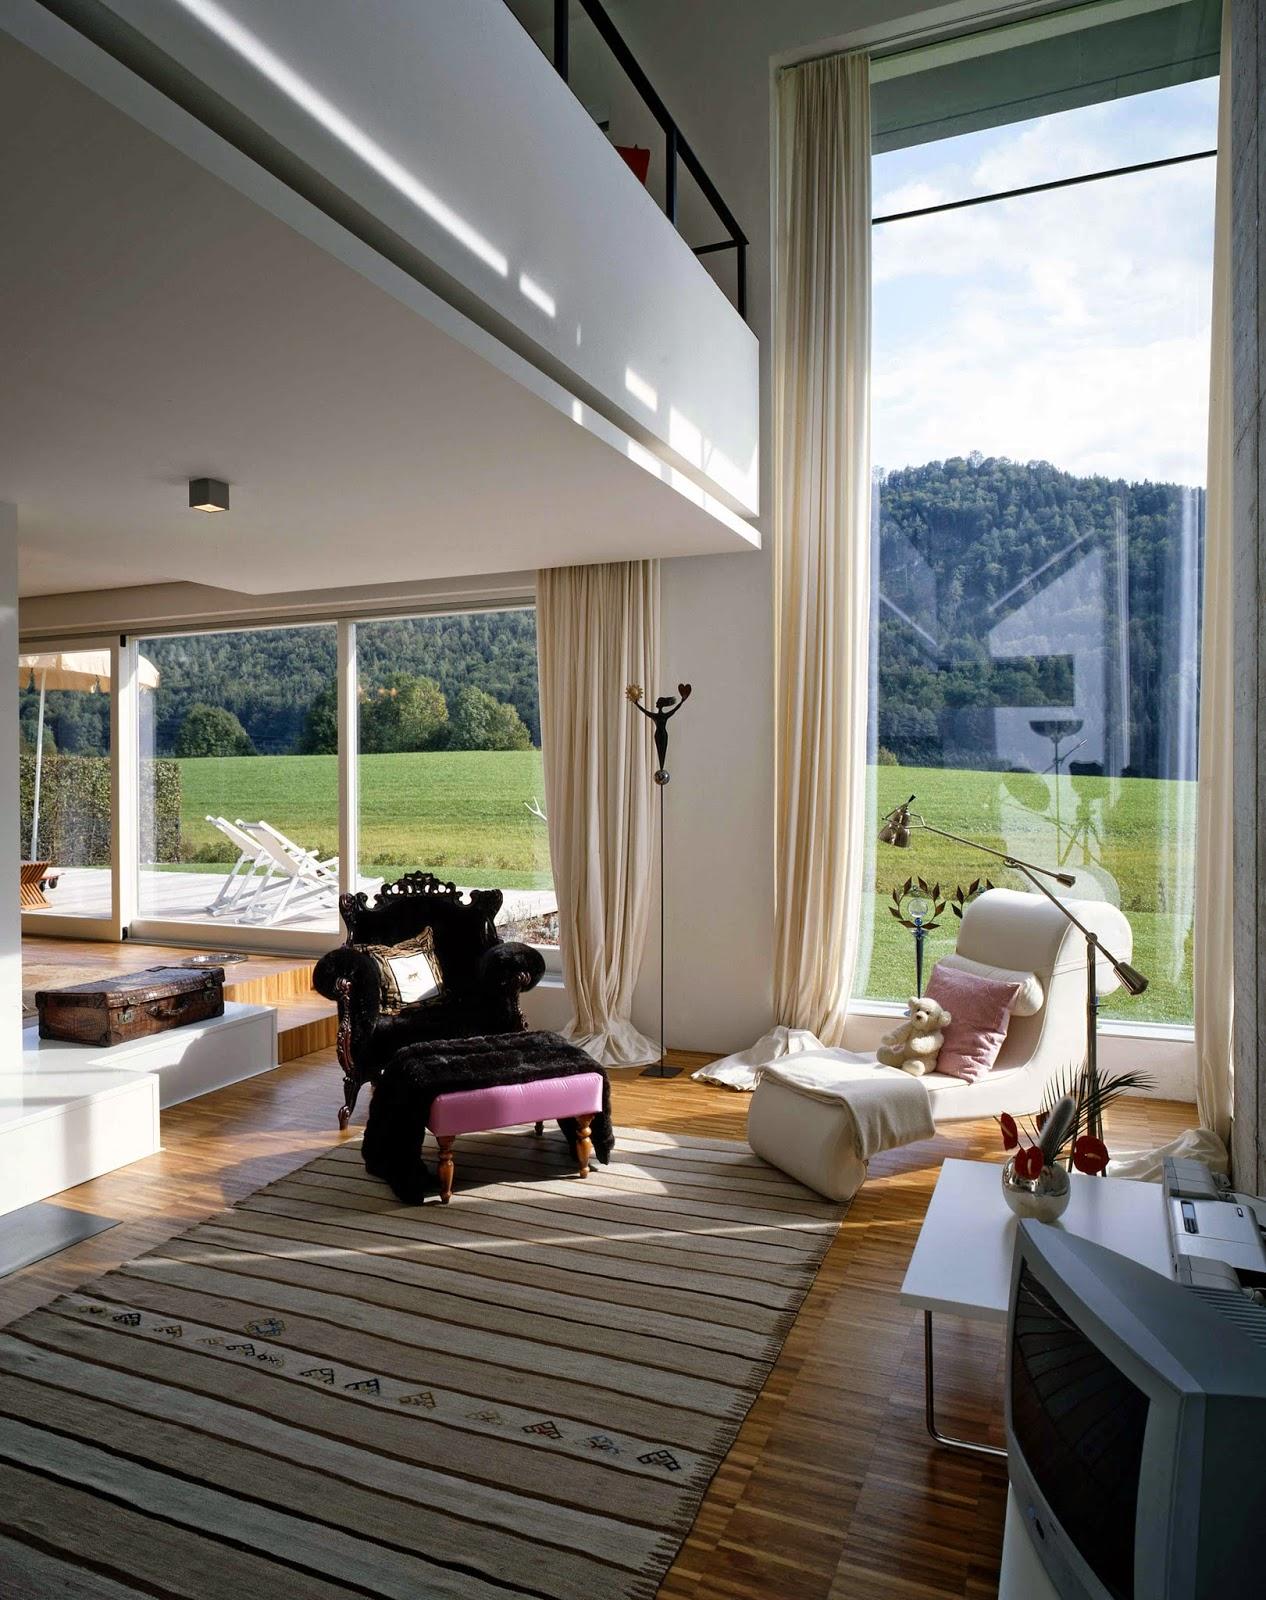 vidro-protecao-solar-habitat